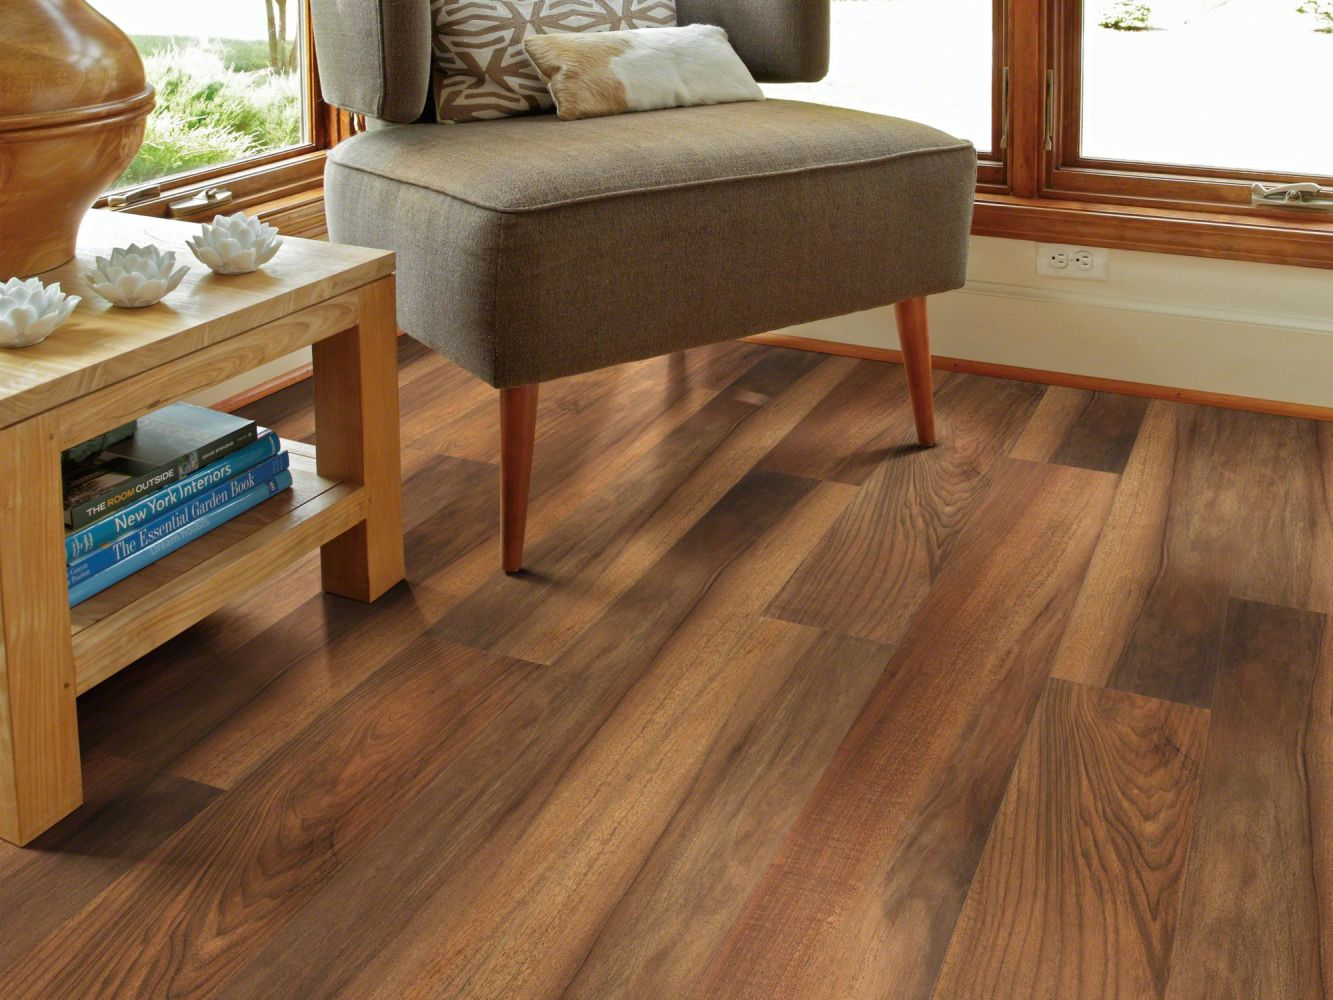 Shaw Floors Resilient Residential Piancavallo Plus Amber Oak 00820_HSS47